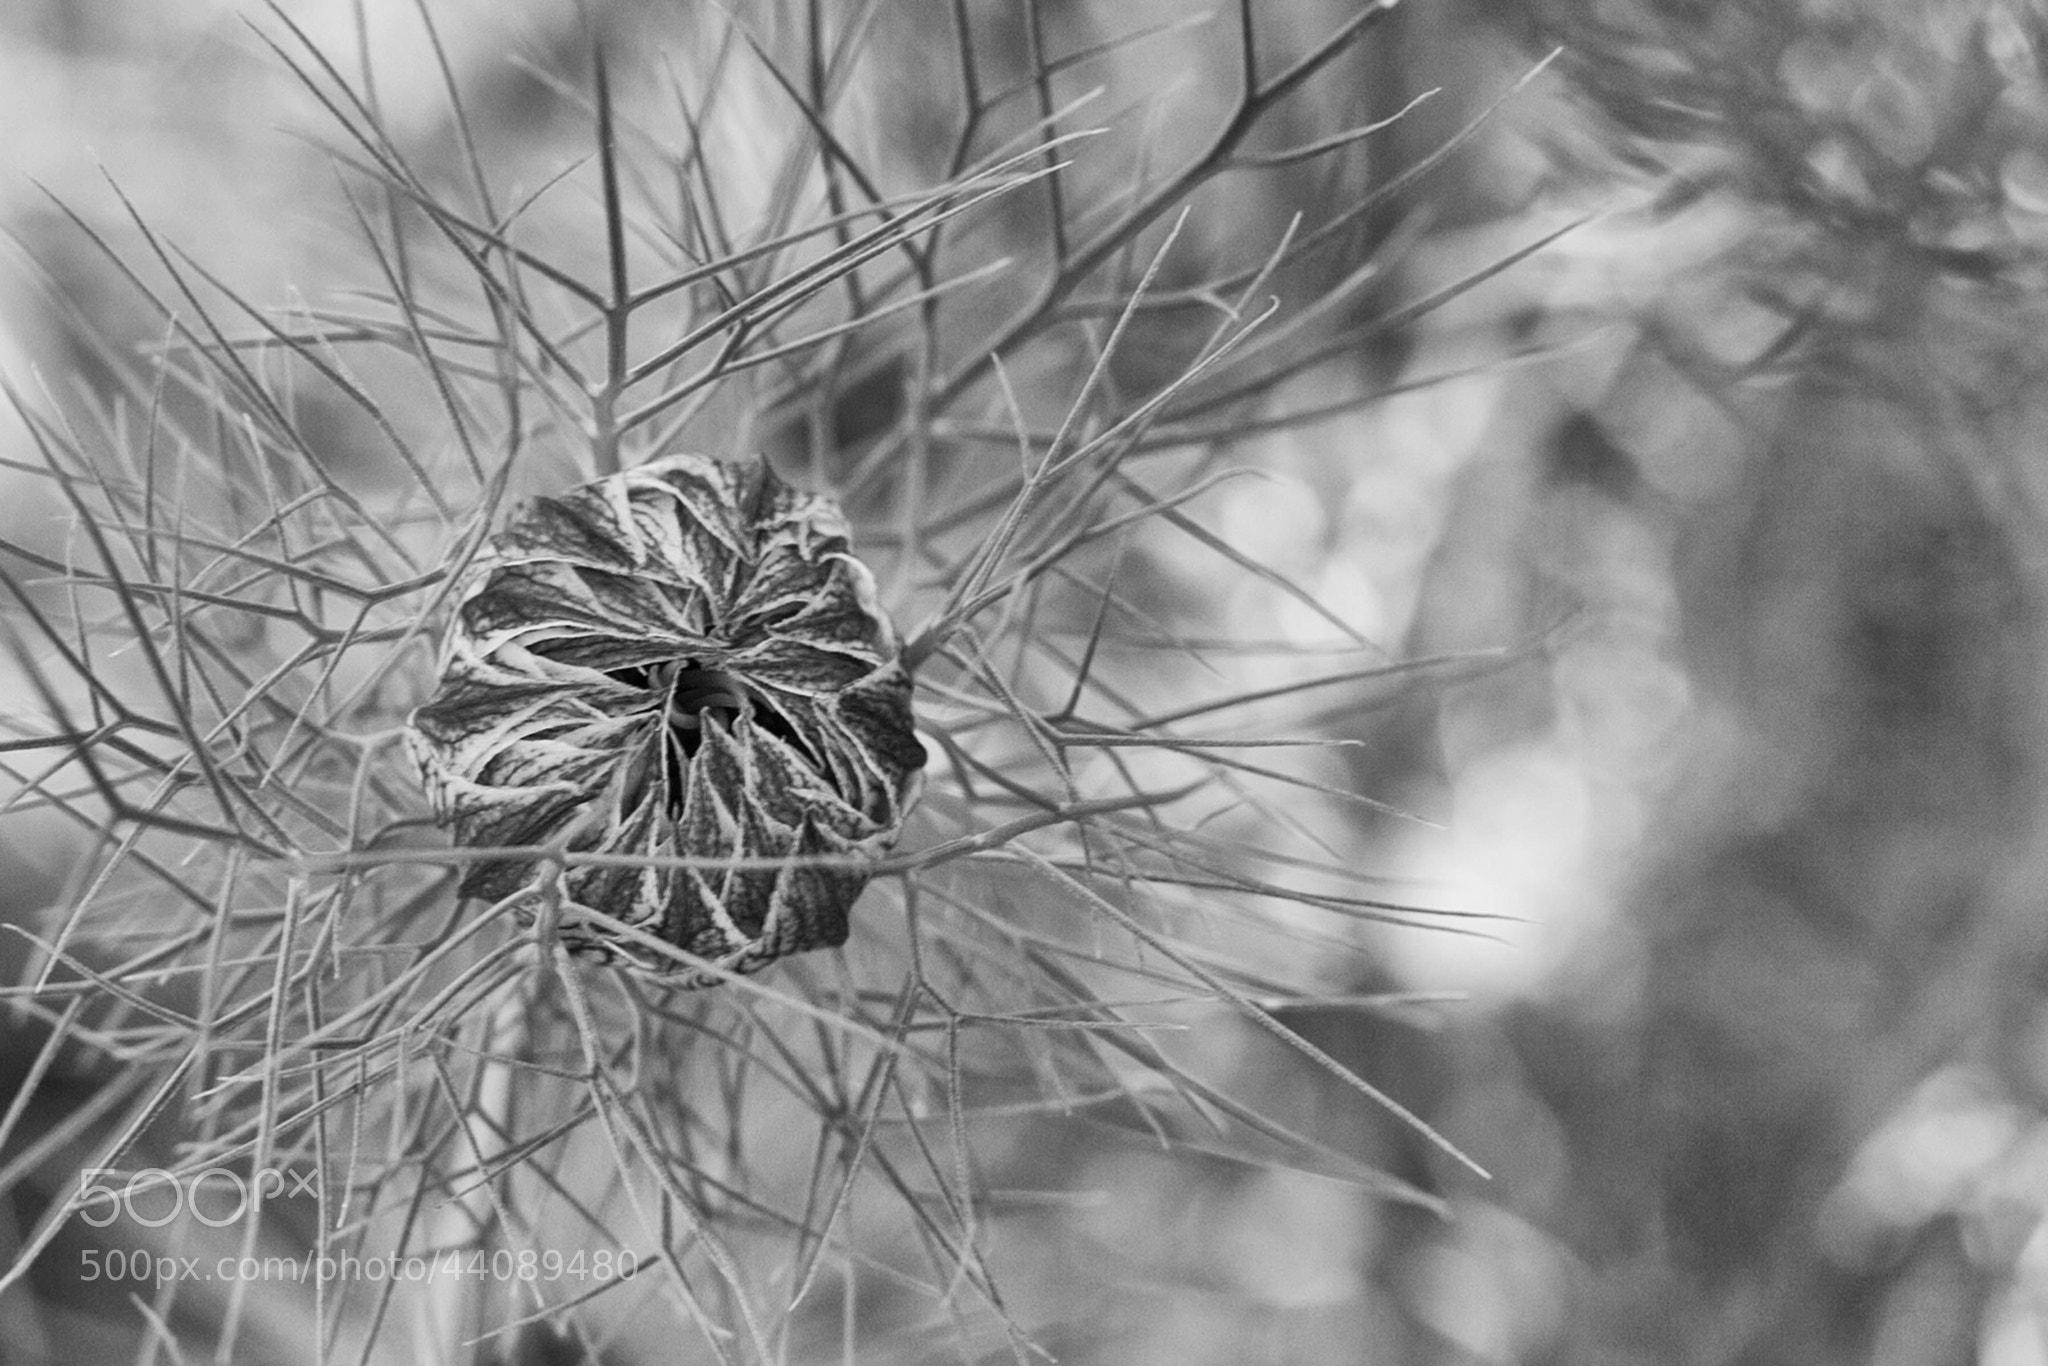 Photograph Garden Alien by Carl Mickleburgh on 500px